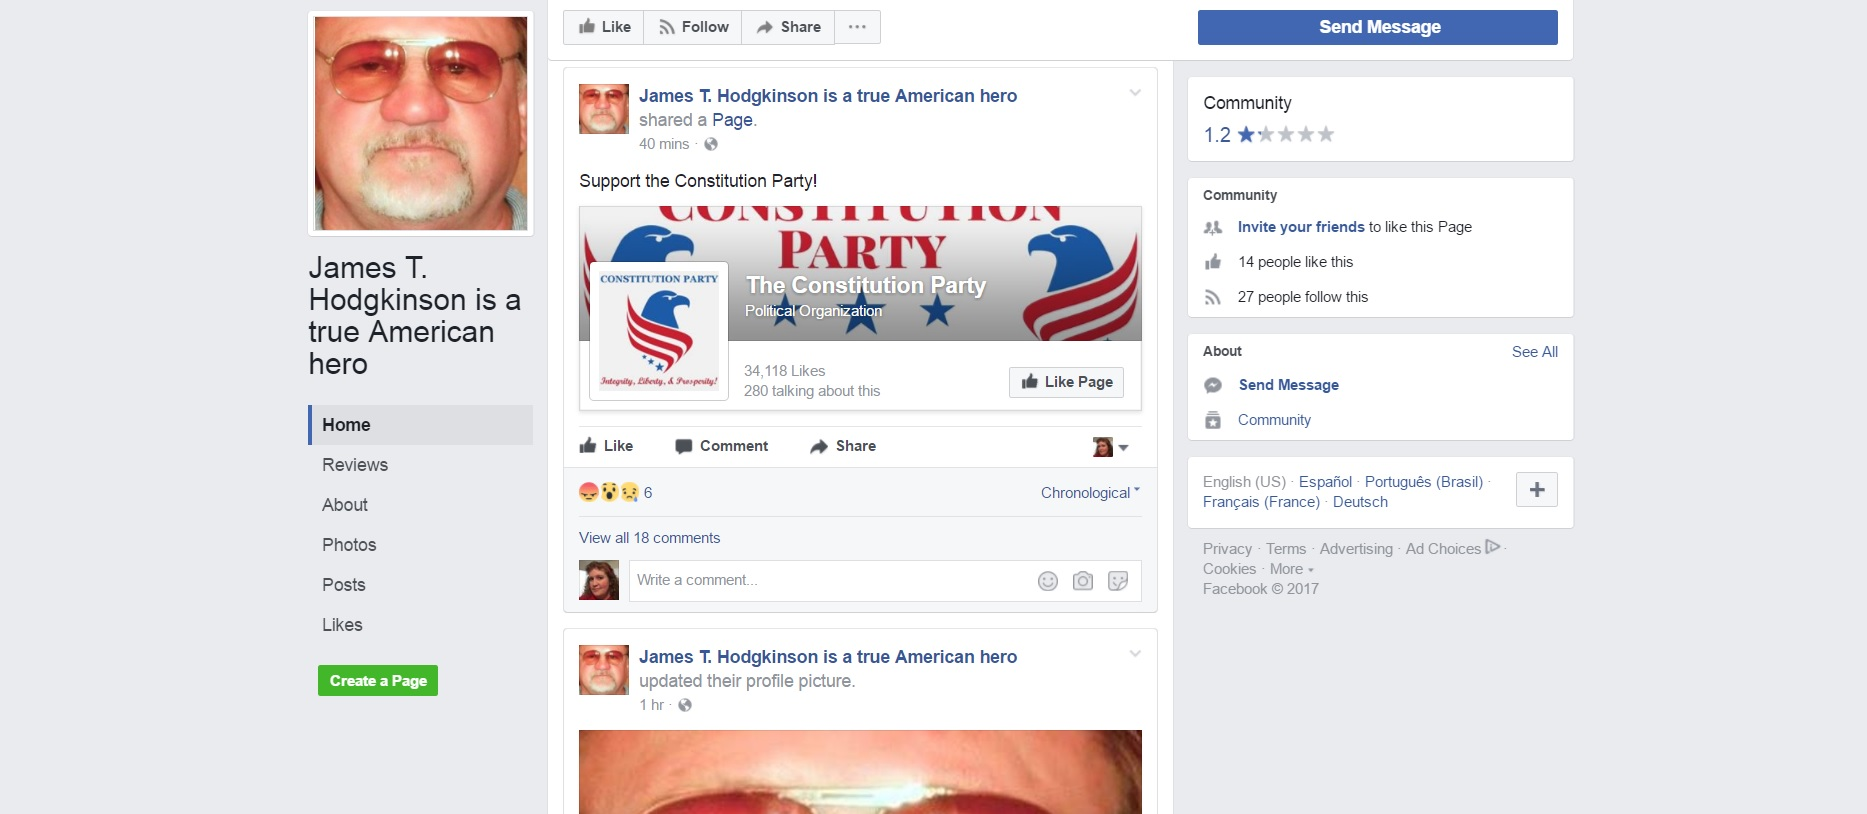 Facebook Page PRAISING The GOP Baseball Shooter